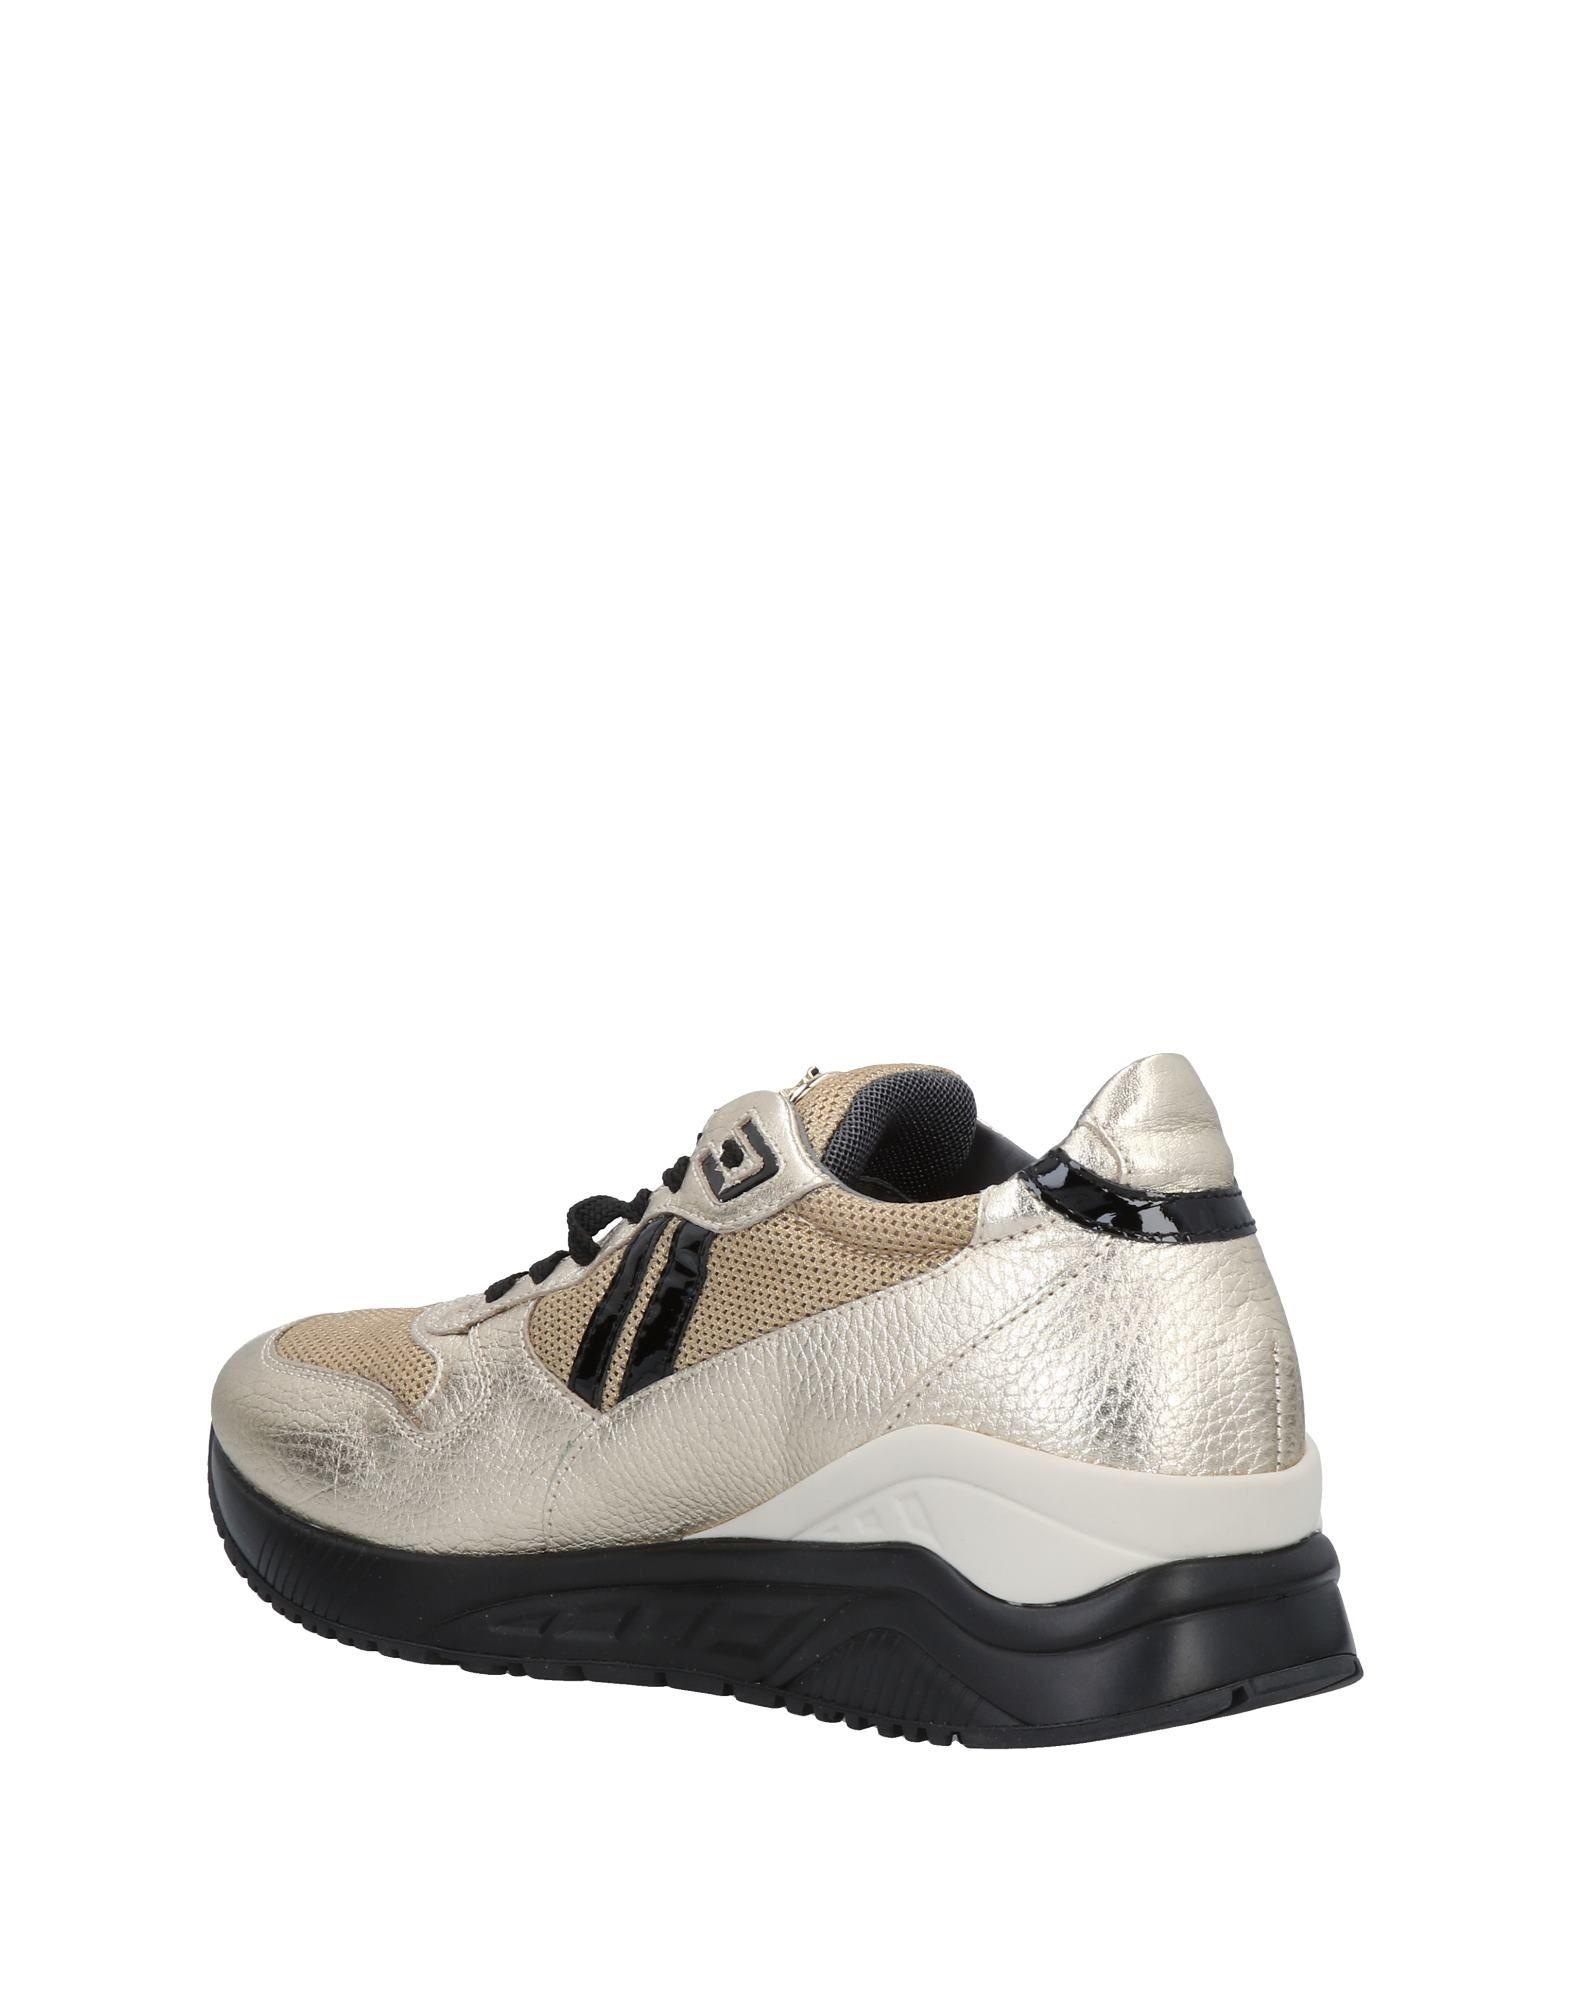 Stilvolle billige Schuhe Damen Cesare Paciotti 4Us Sneakers Damen Schuhe  11487631VU e1bd86